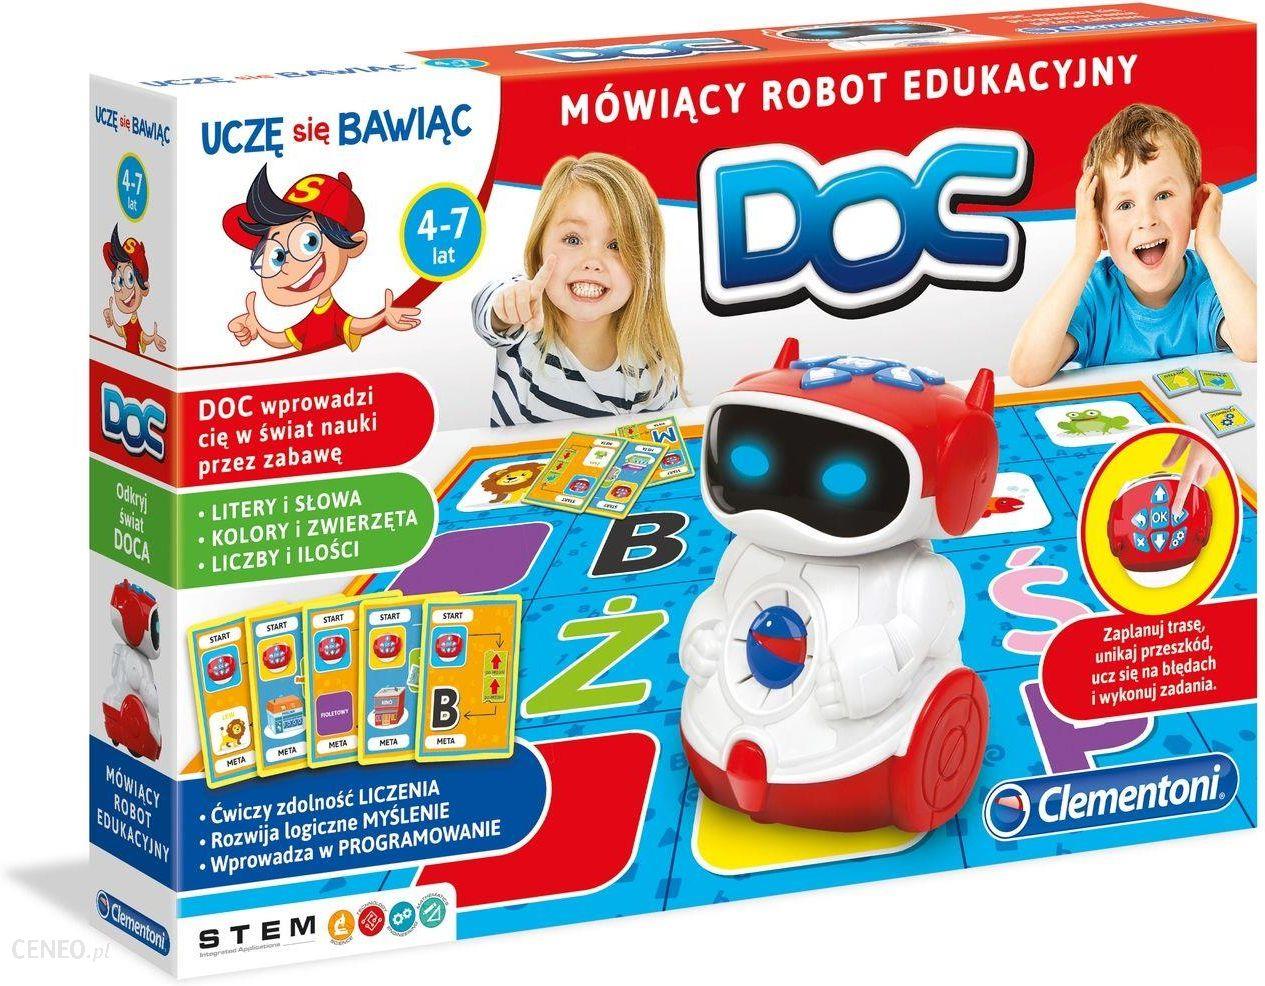 https://image.ceneo.pl/data/products/51713814/i-clementoni-doc-mowiacy-robot-edukacyjny-60972.jpg